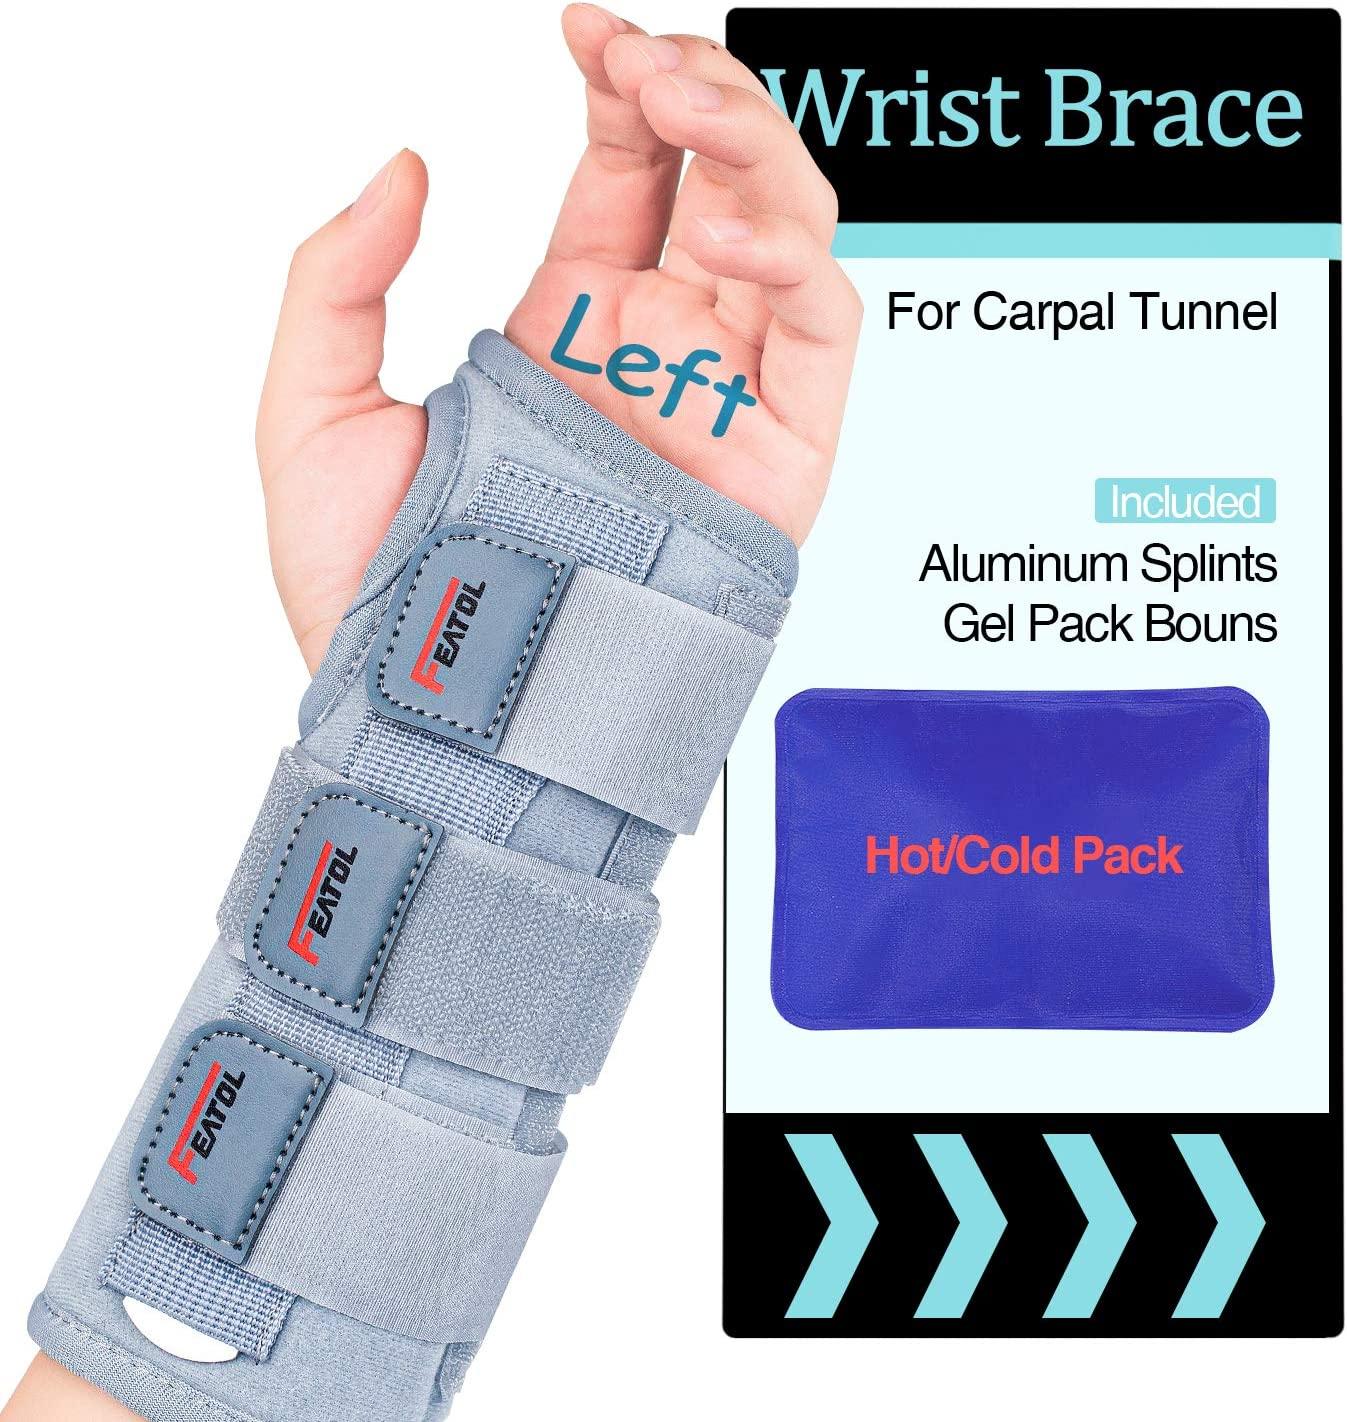 Carpal Tunnel Wrist Brace | Night Sleep Support Brace, Removable Metal Wrist Splint- Hot/Ice Pack, Left Hand, Medium/Large, Adjustable Hand Brace for Men, Women, Relieve and Treat Wrist Pain